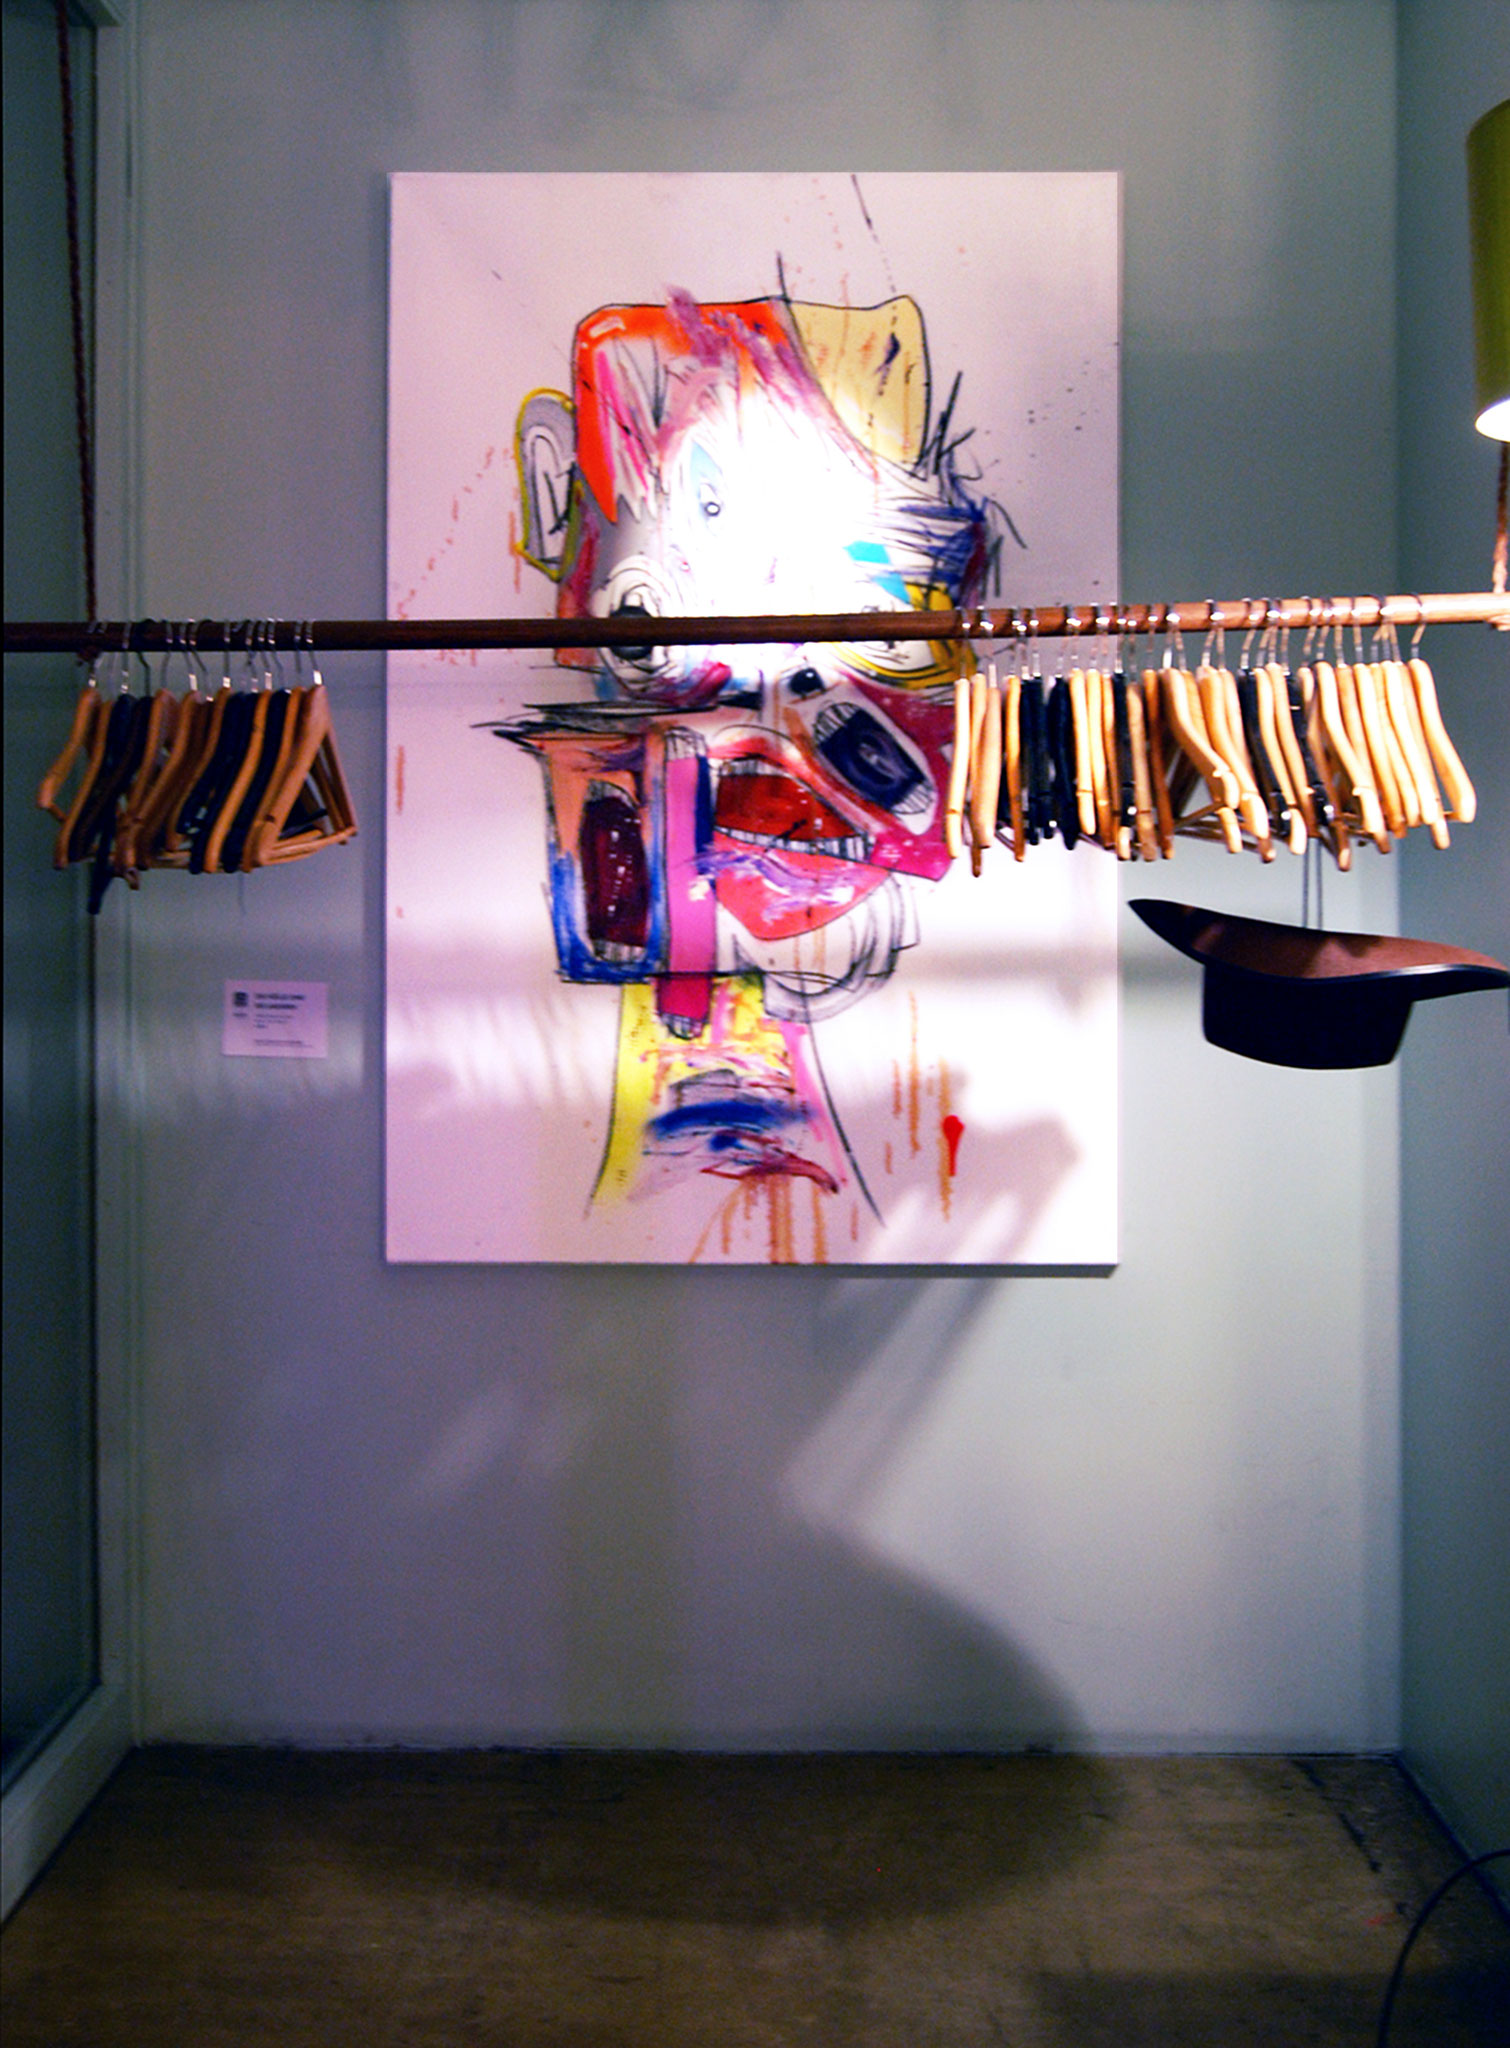 DIE HÖLLE SIND DIE ANDEREN, 2018, mixed media on canvas, 150x100cm